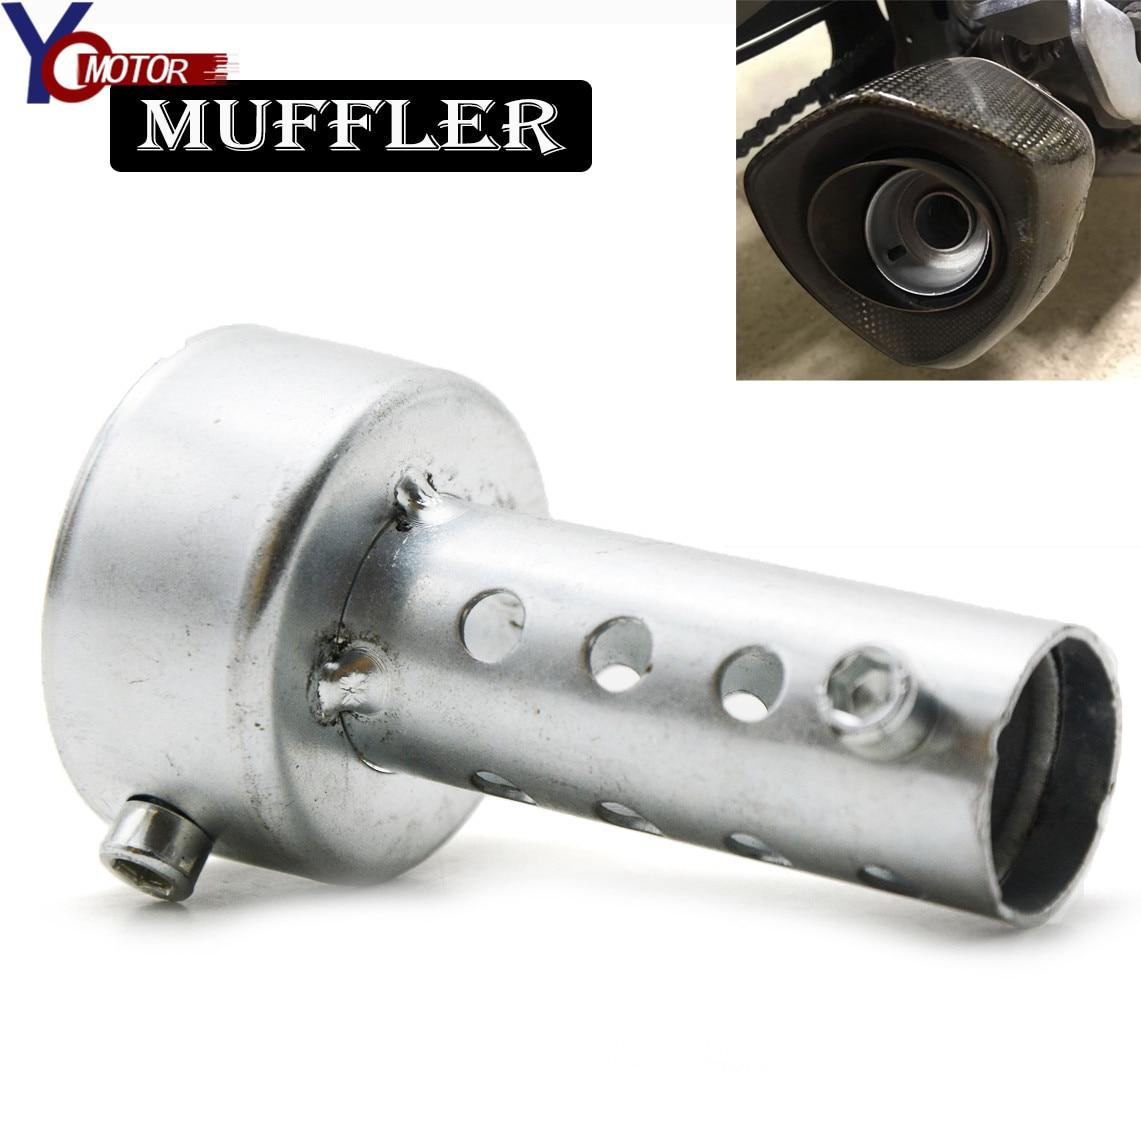 Motocicleta para DUCATI MONSTER 696 796 796 848 KX65 KX80 KX85 silenciador de escape DB Killer silenciador insertar ruido eliminador de sonido Máquina de ruido para reducir/disminuir/reducir el ruido del vecino de arriba, eliminador de ruido/eliminador de sonido/silenciador